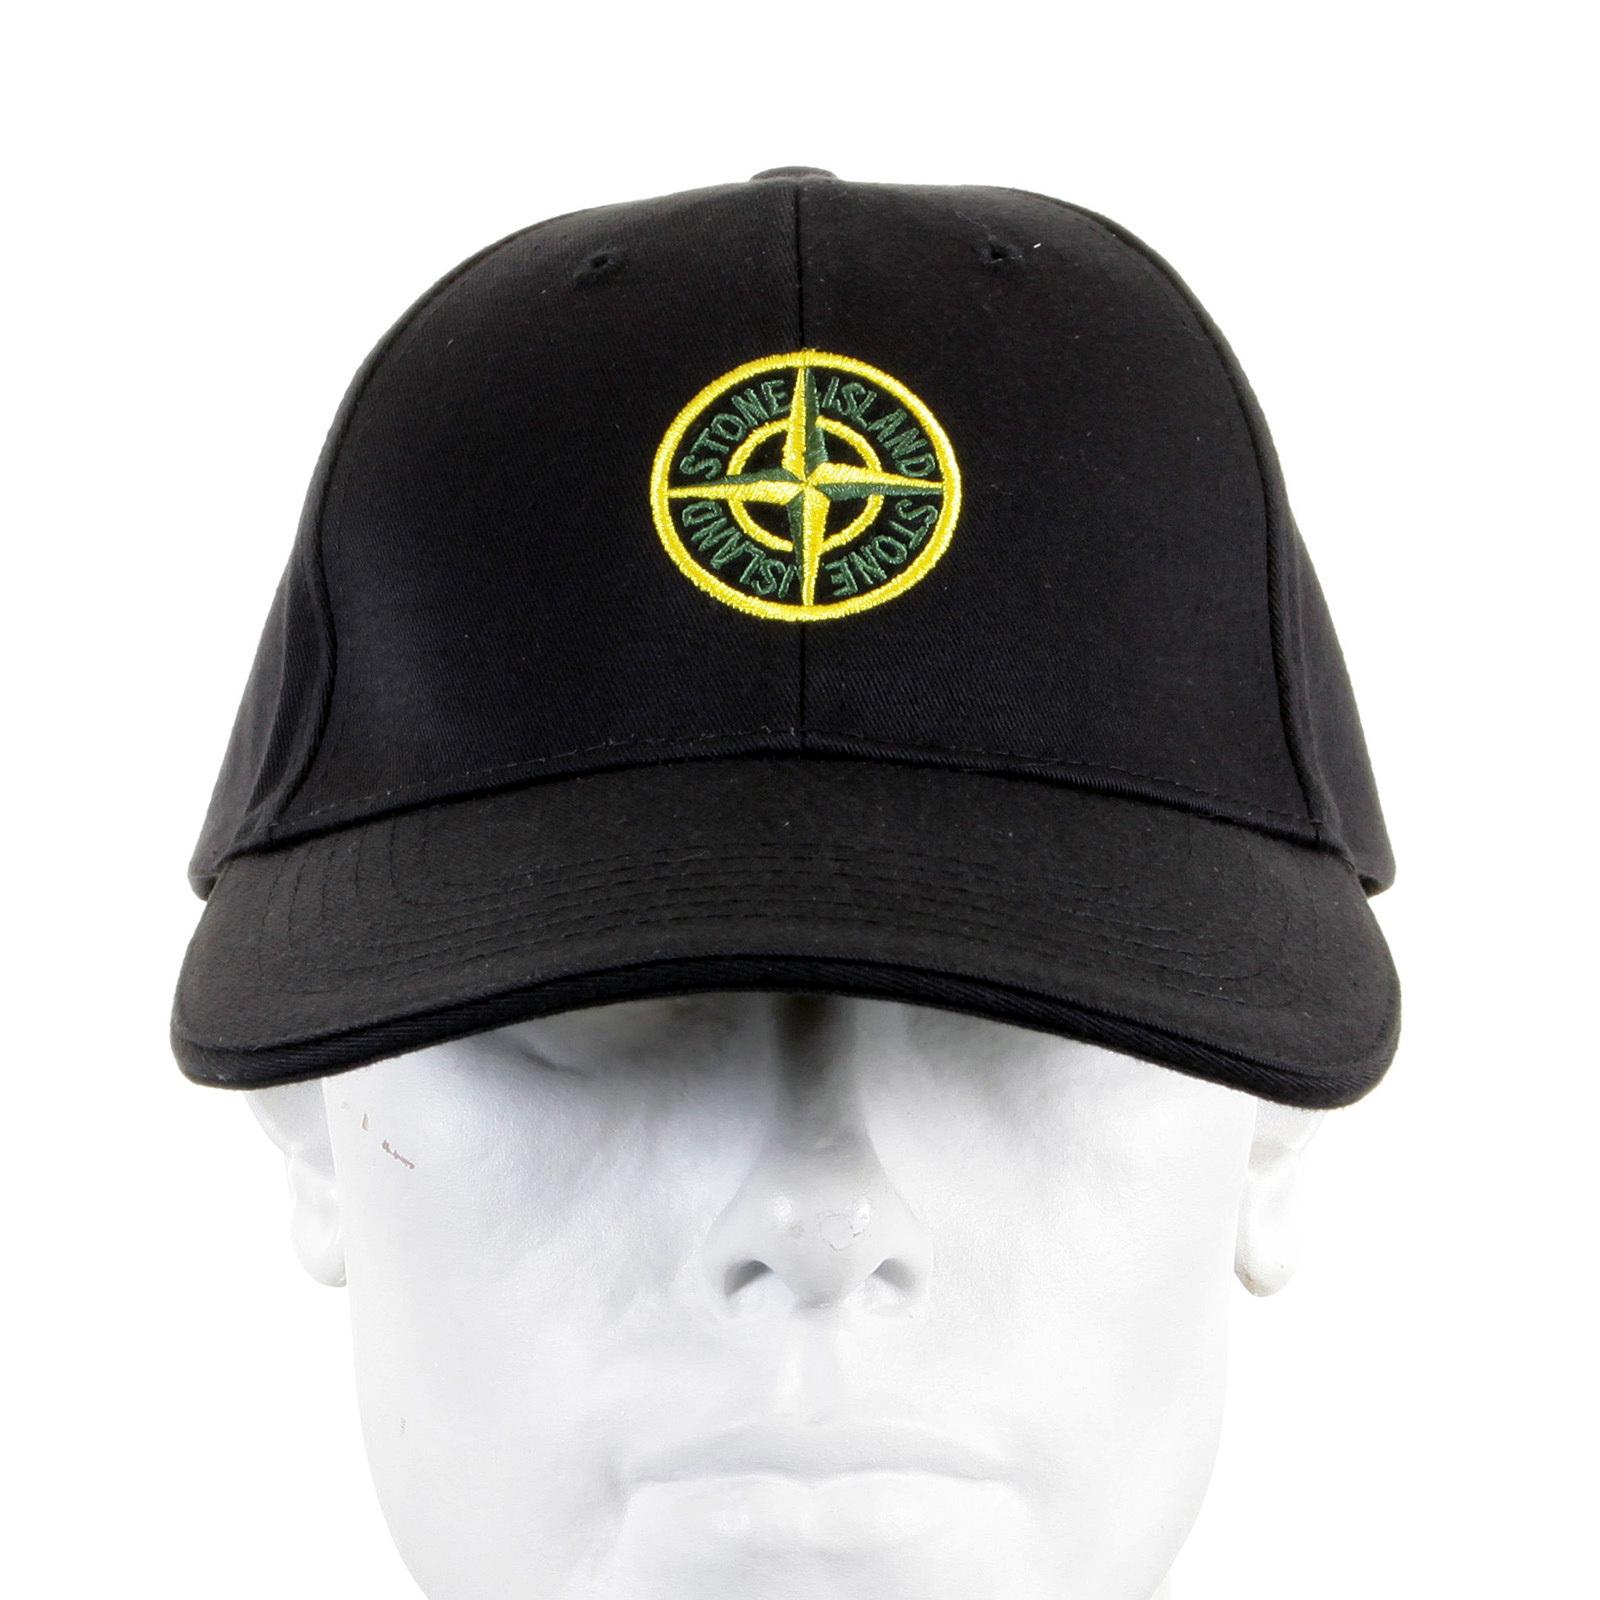 6714b9a1f21 Stone Island Cap black cotton baseball cap SI2756 at Togged Clothing